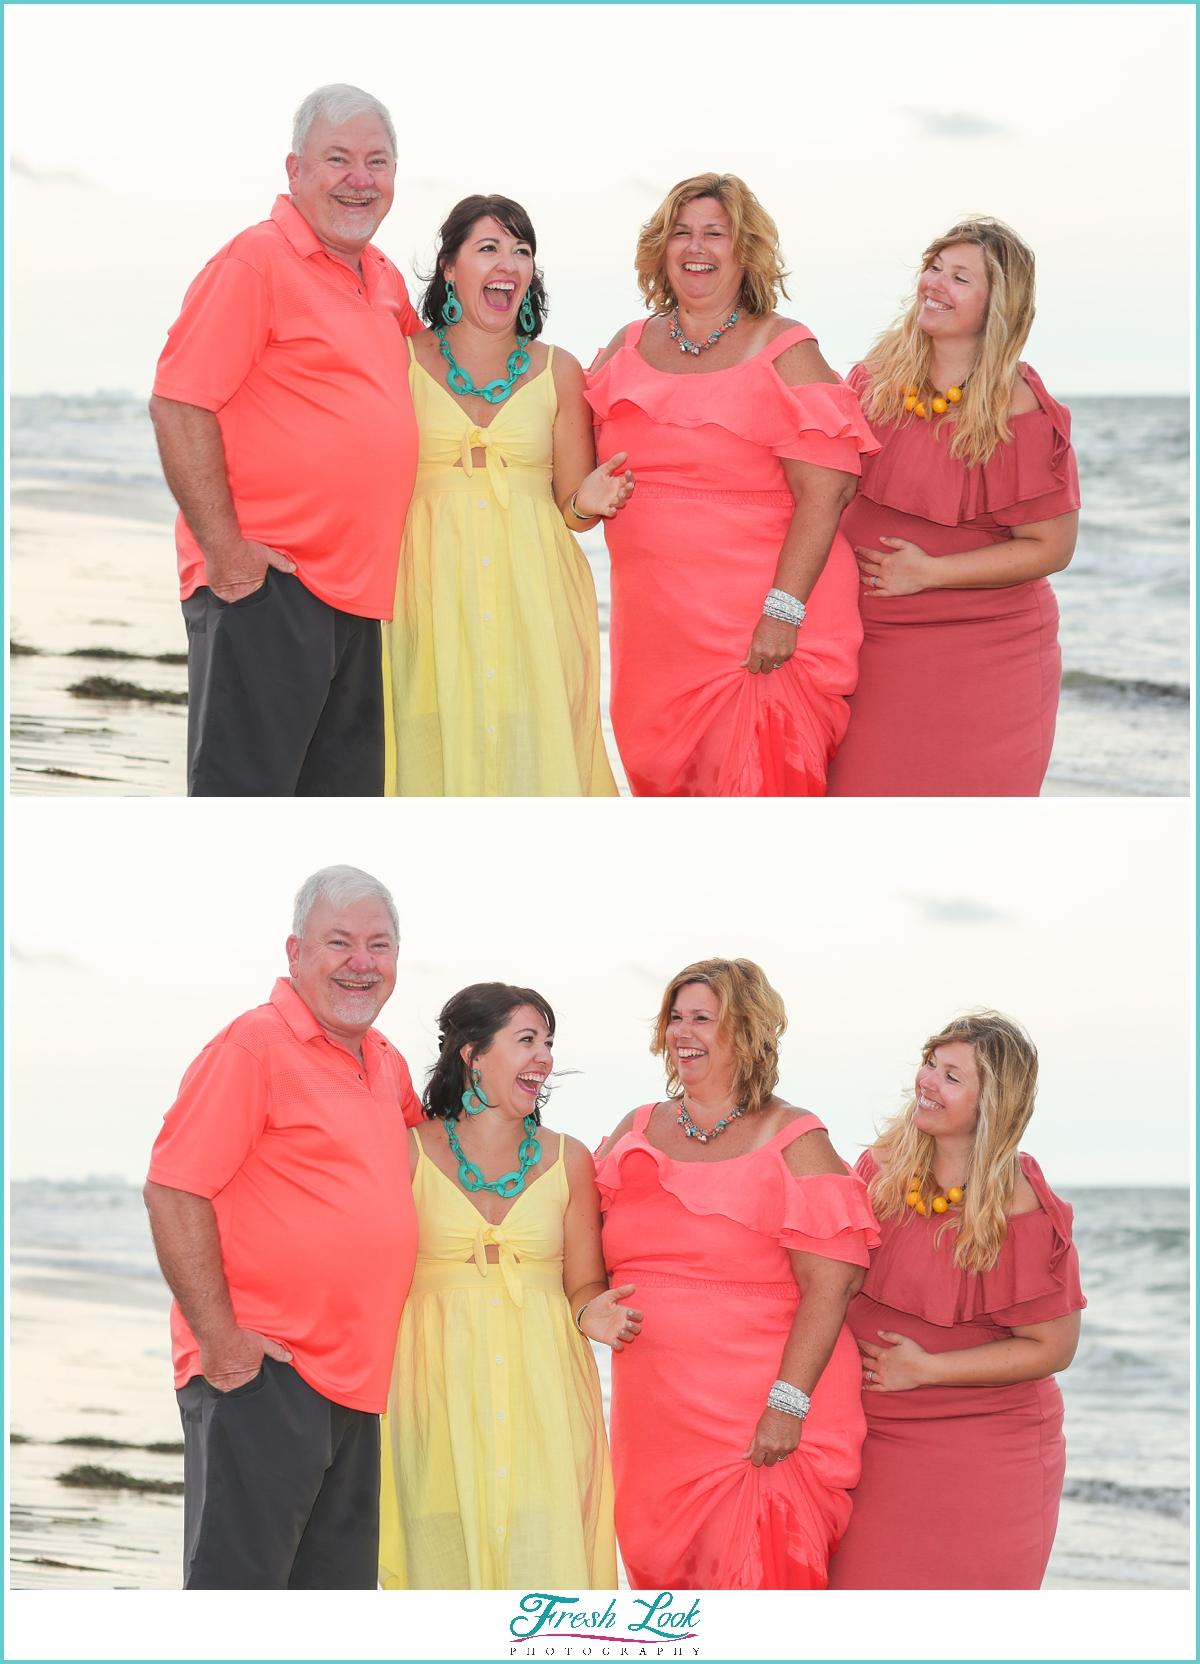 Sandbridge family photoshoot